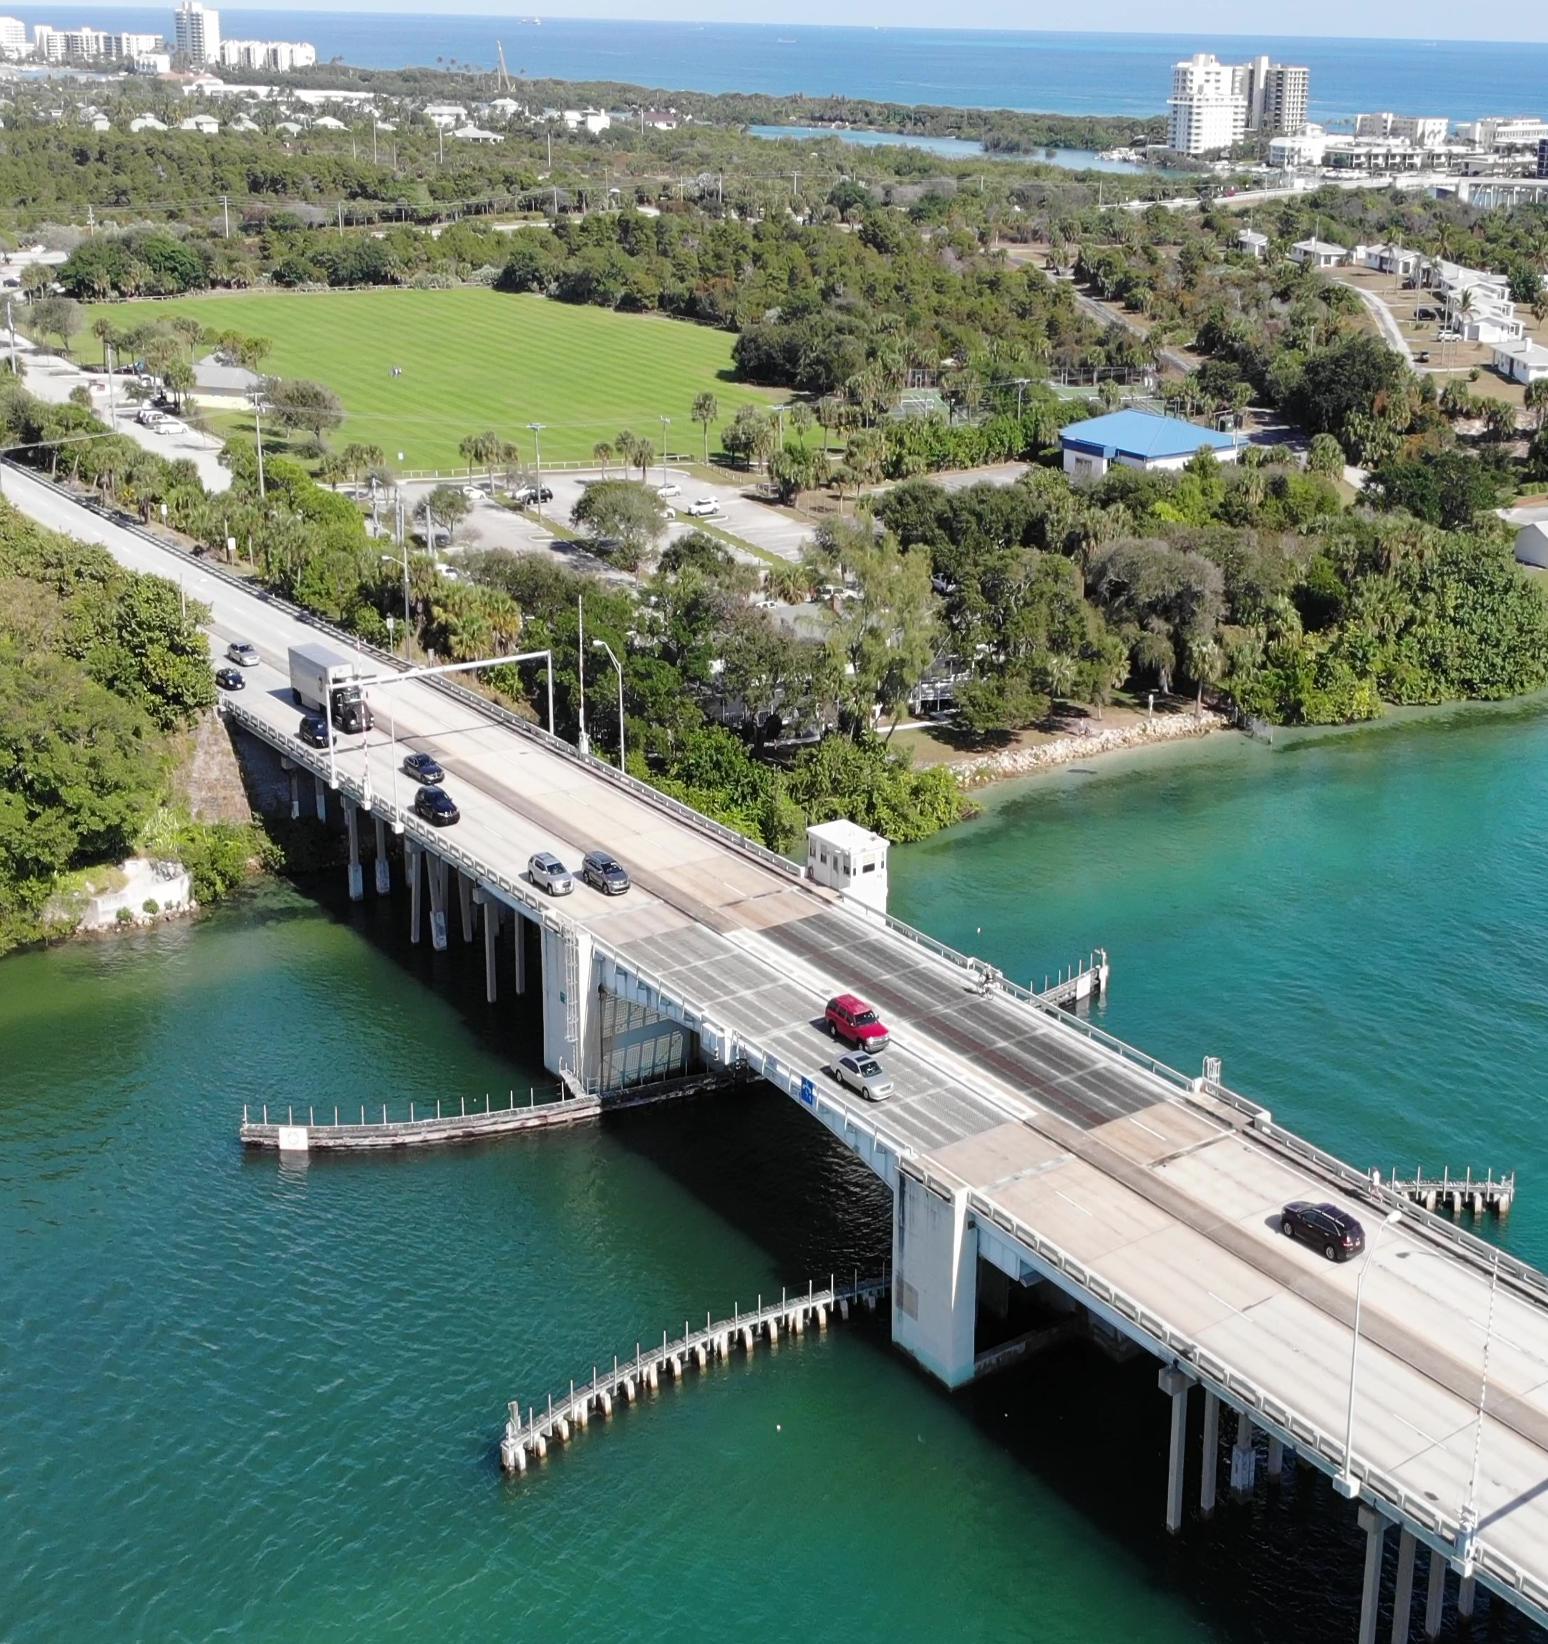 droneimageofthejupiterbridge